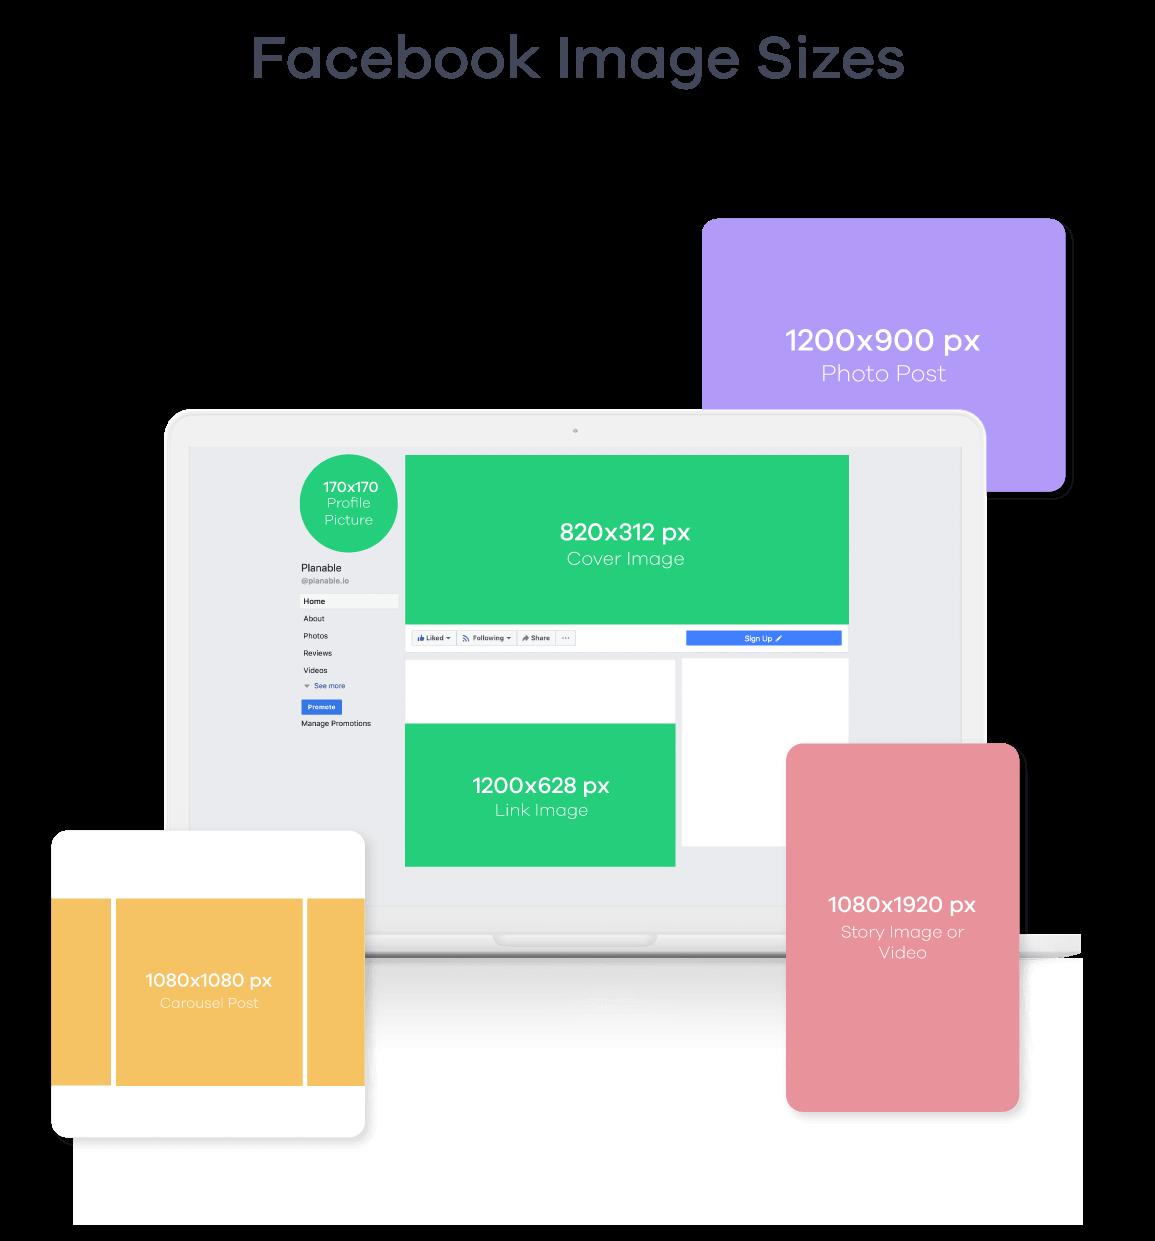 facebook image sizes 2019